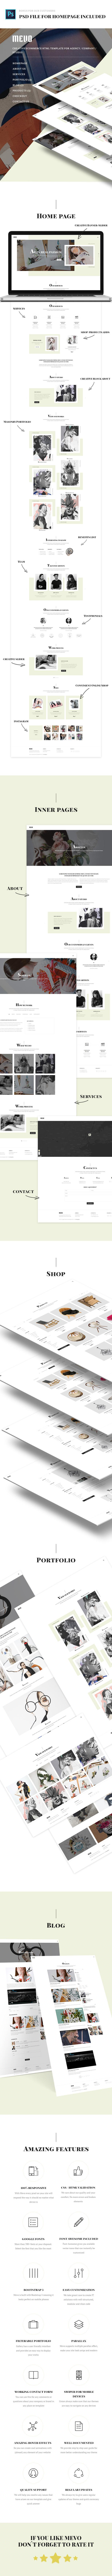 Mevo - Creative eCommerce HTML Template For Agency / Company / Studio - 1